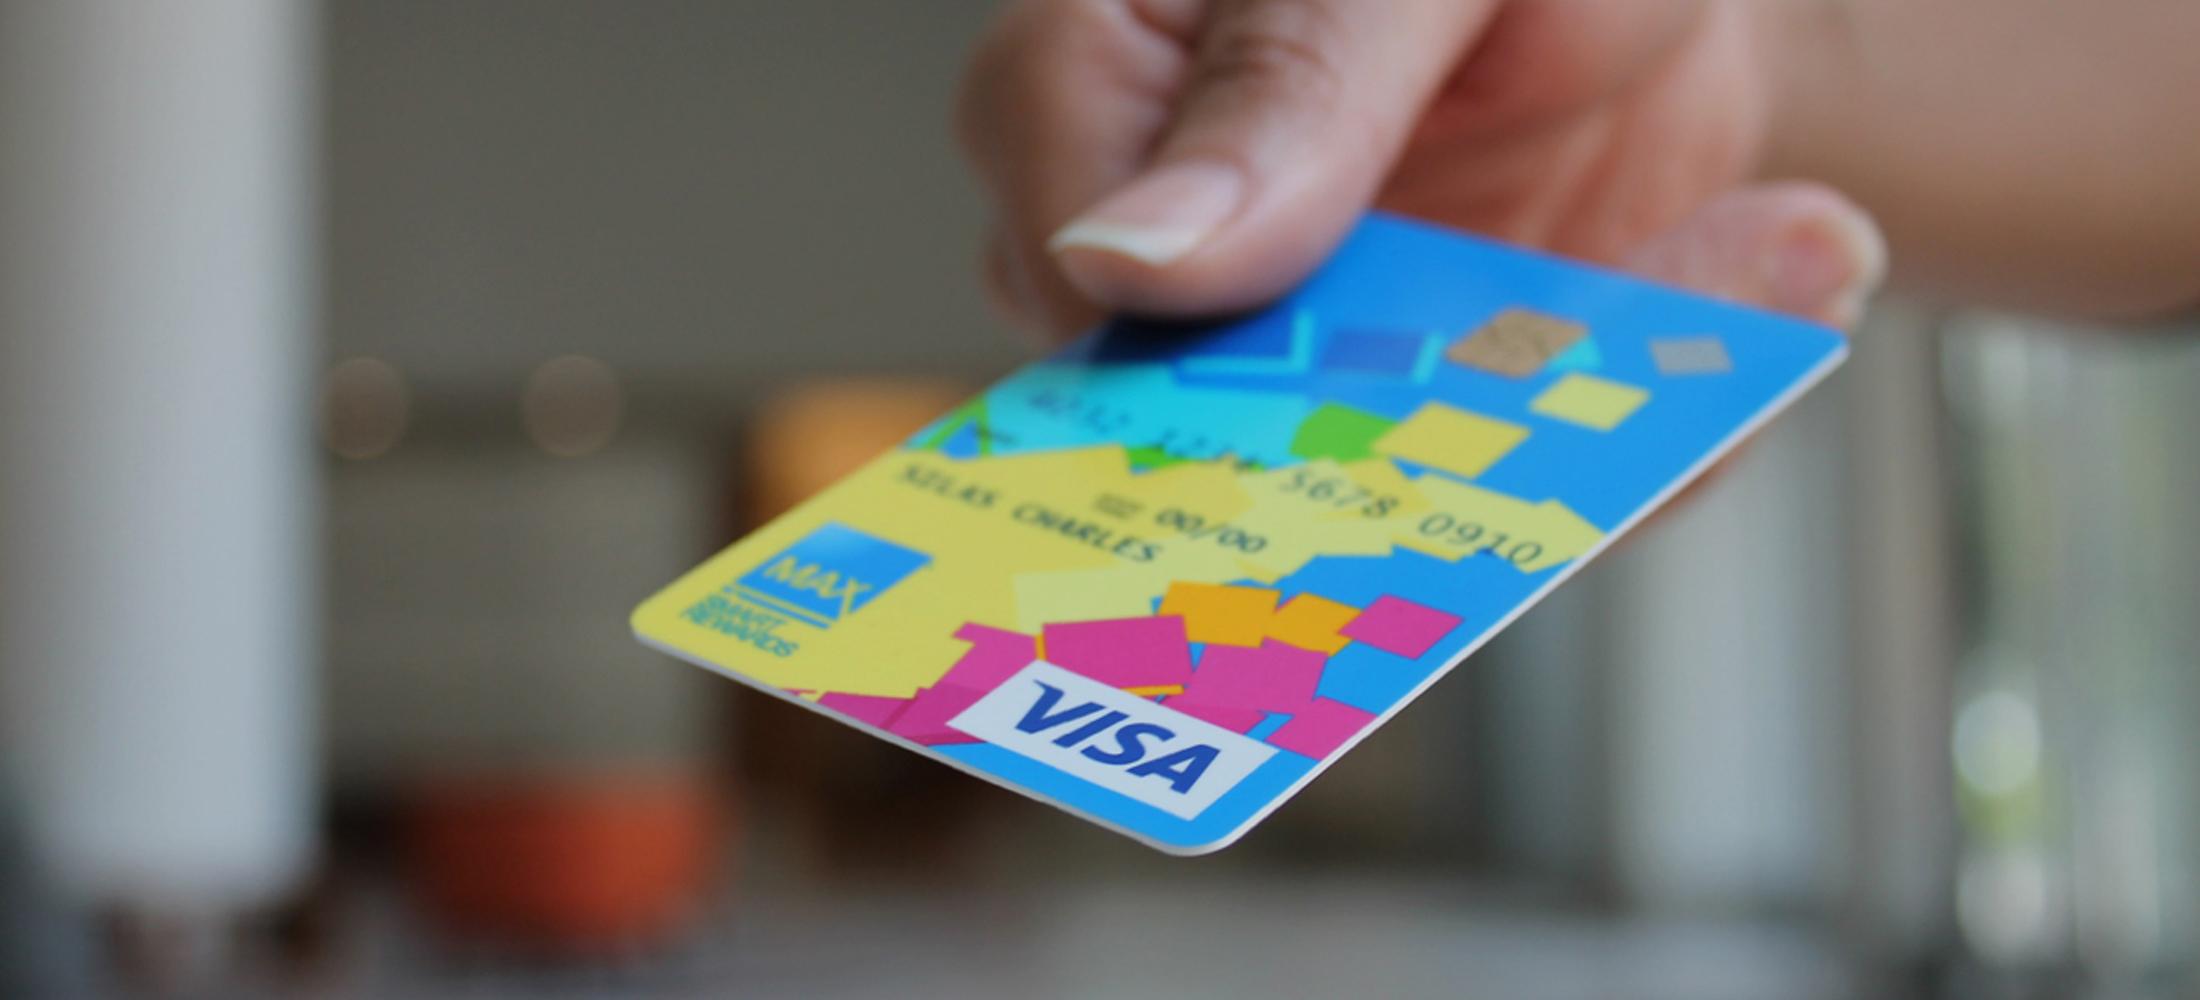 Max Credit Union credit card design